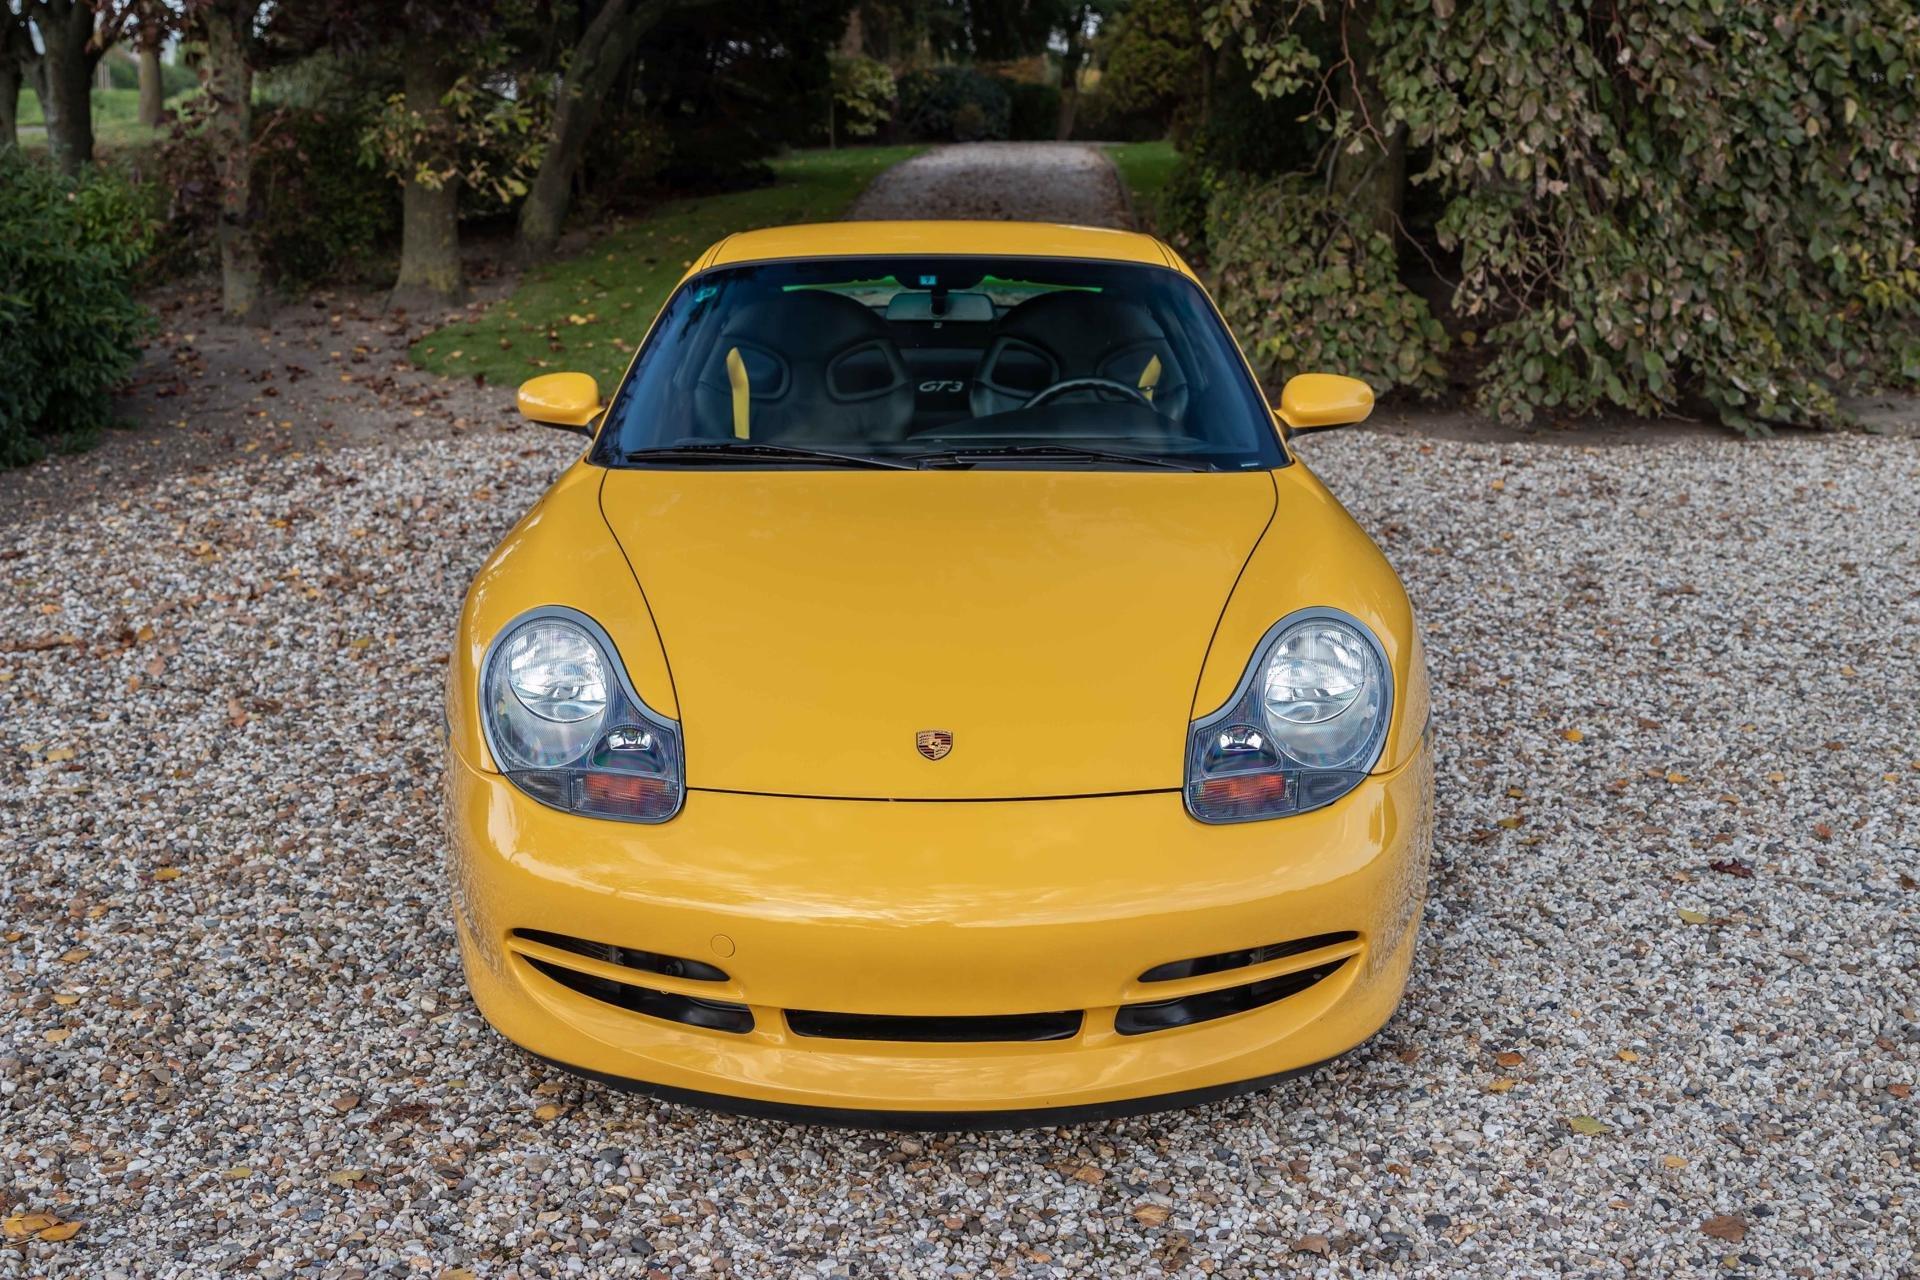 Real Art on Wheels | 2001 Porsche 996 GT3 Mark I